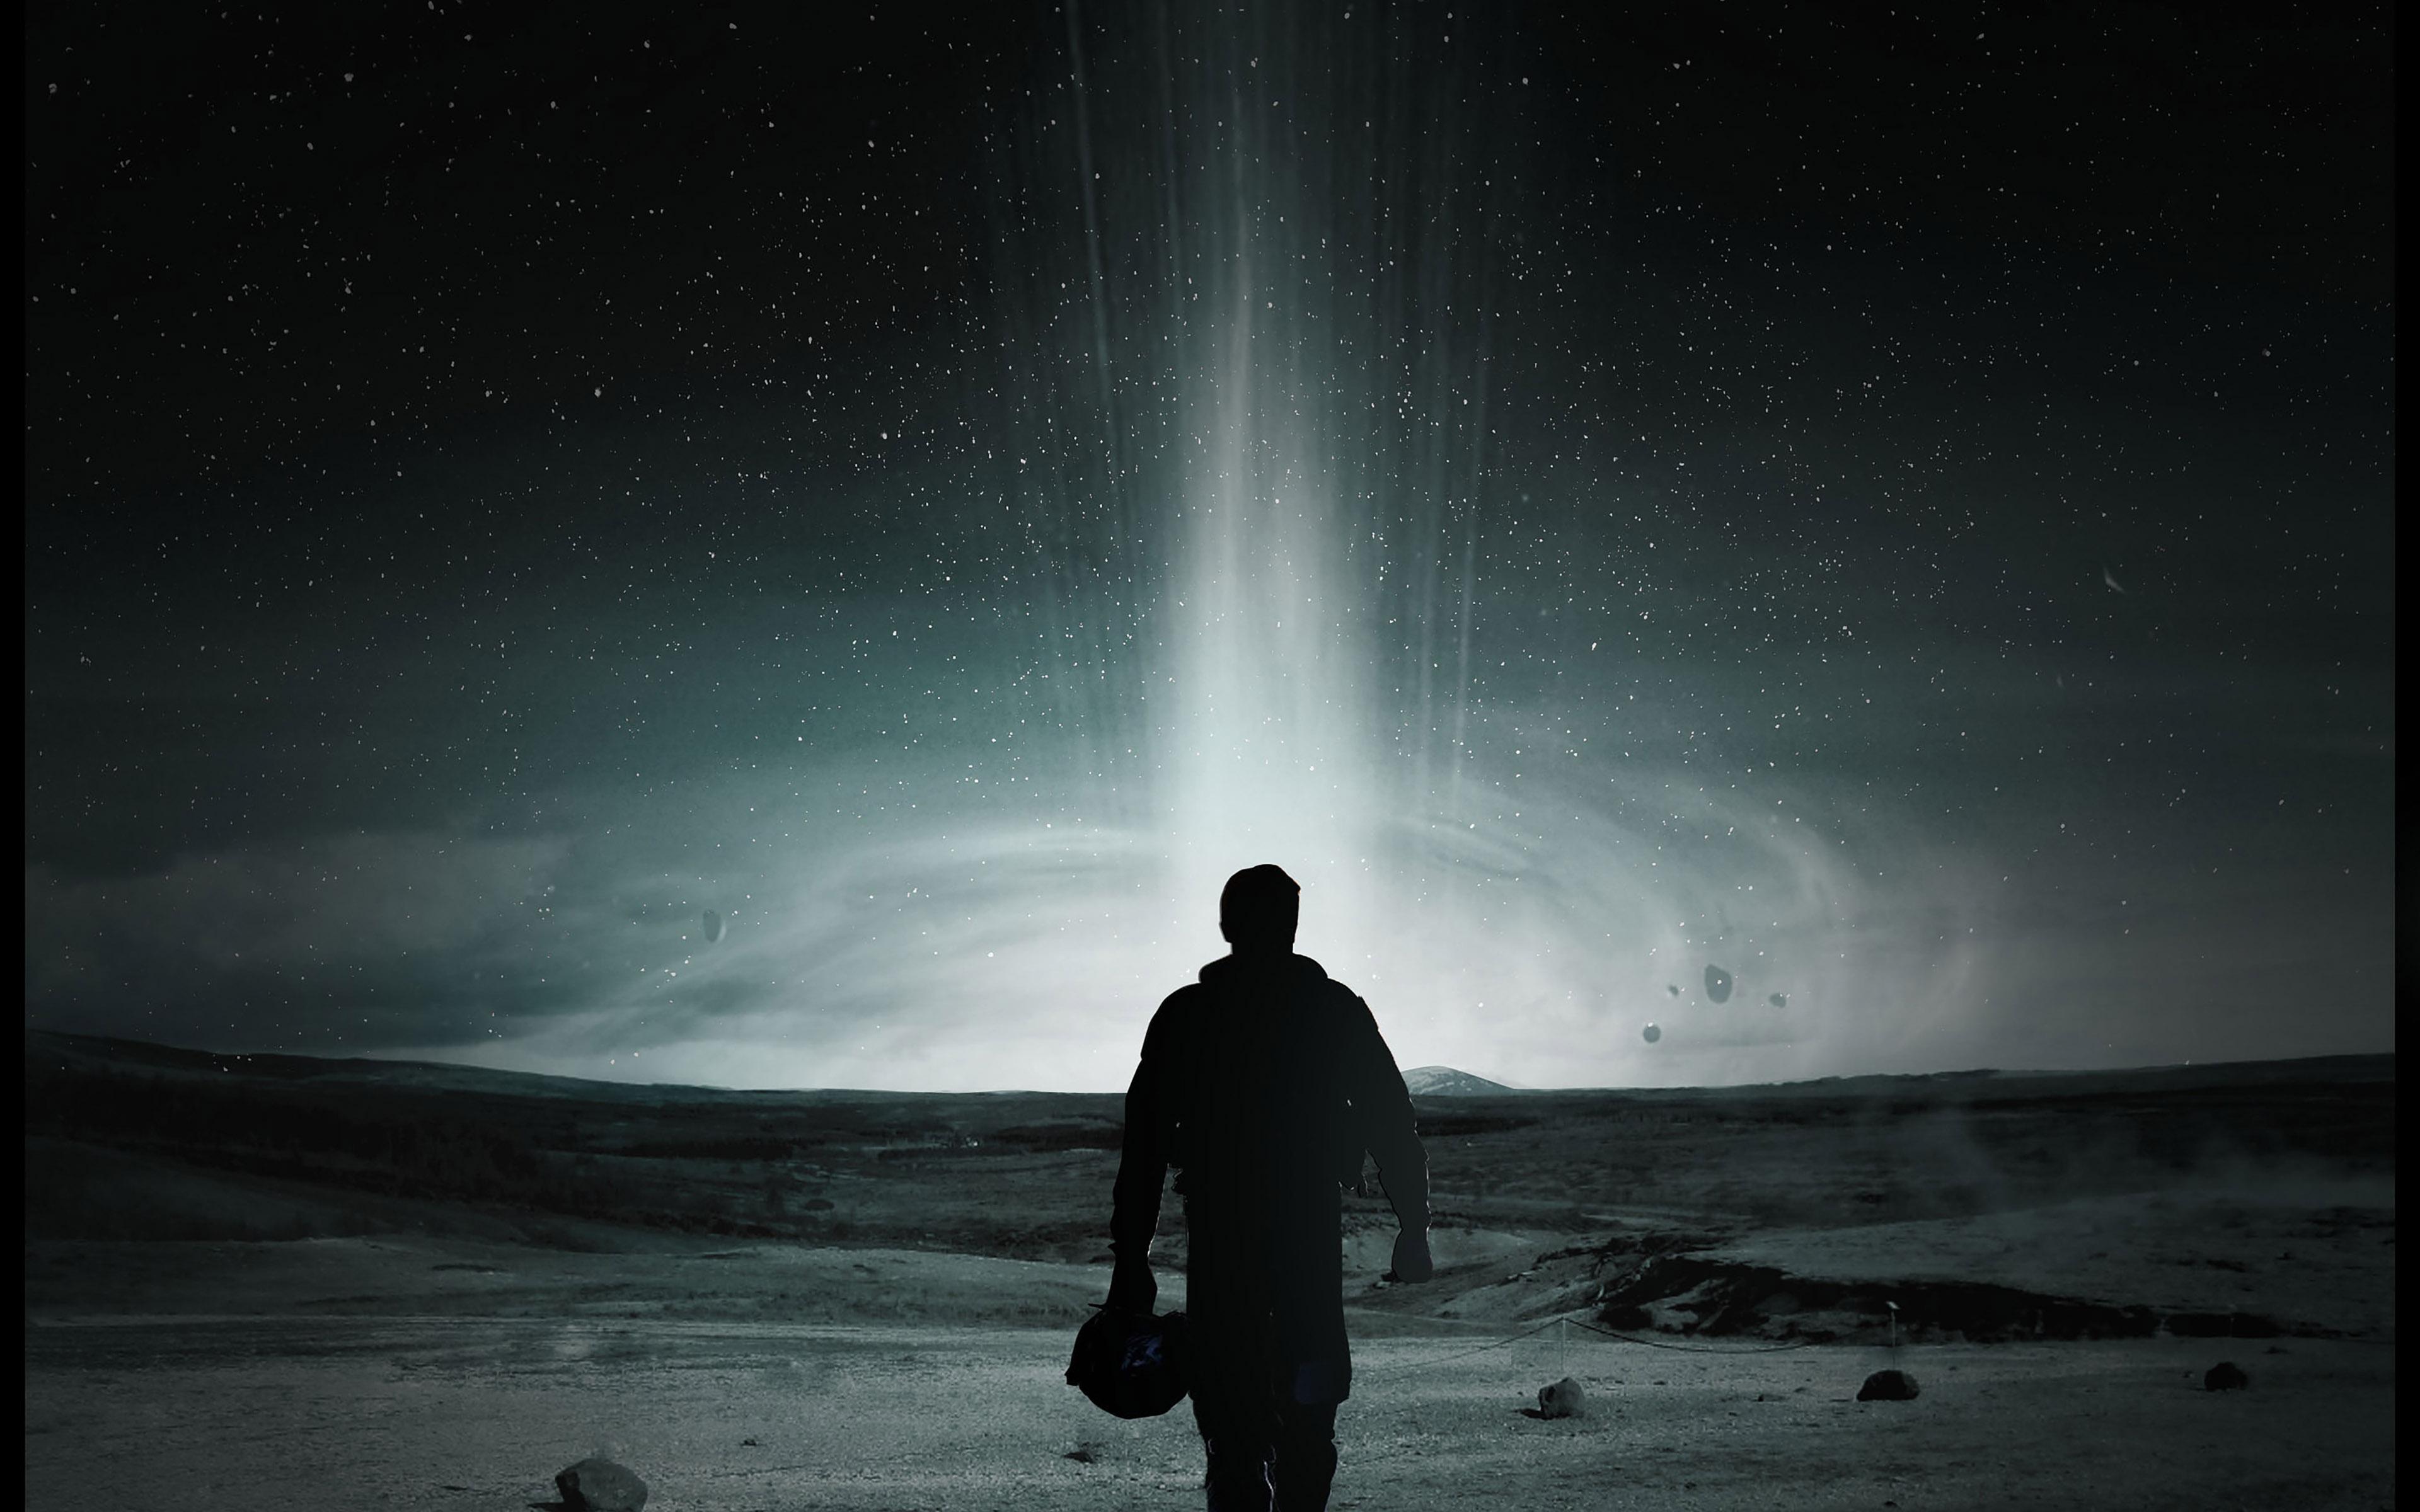 hc86-matthew-mcconaughey-interstellar-space-filme - Papers.co